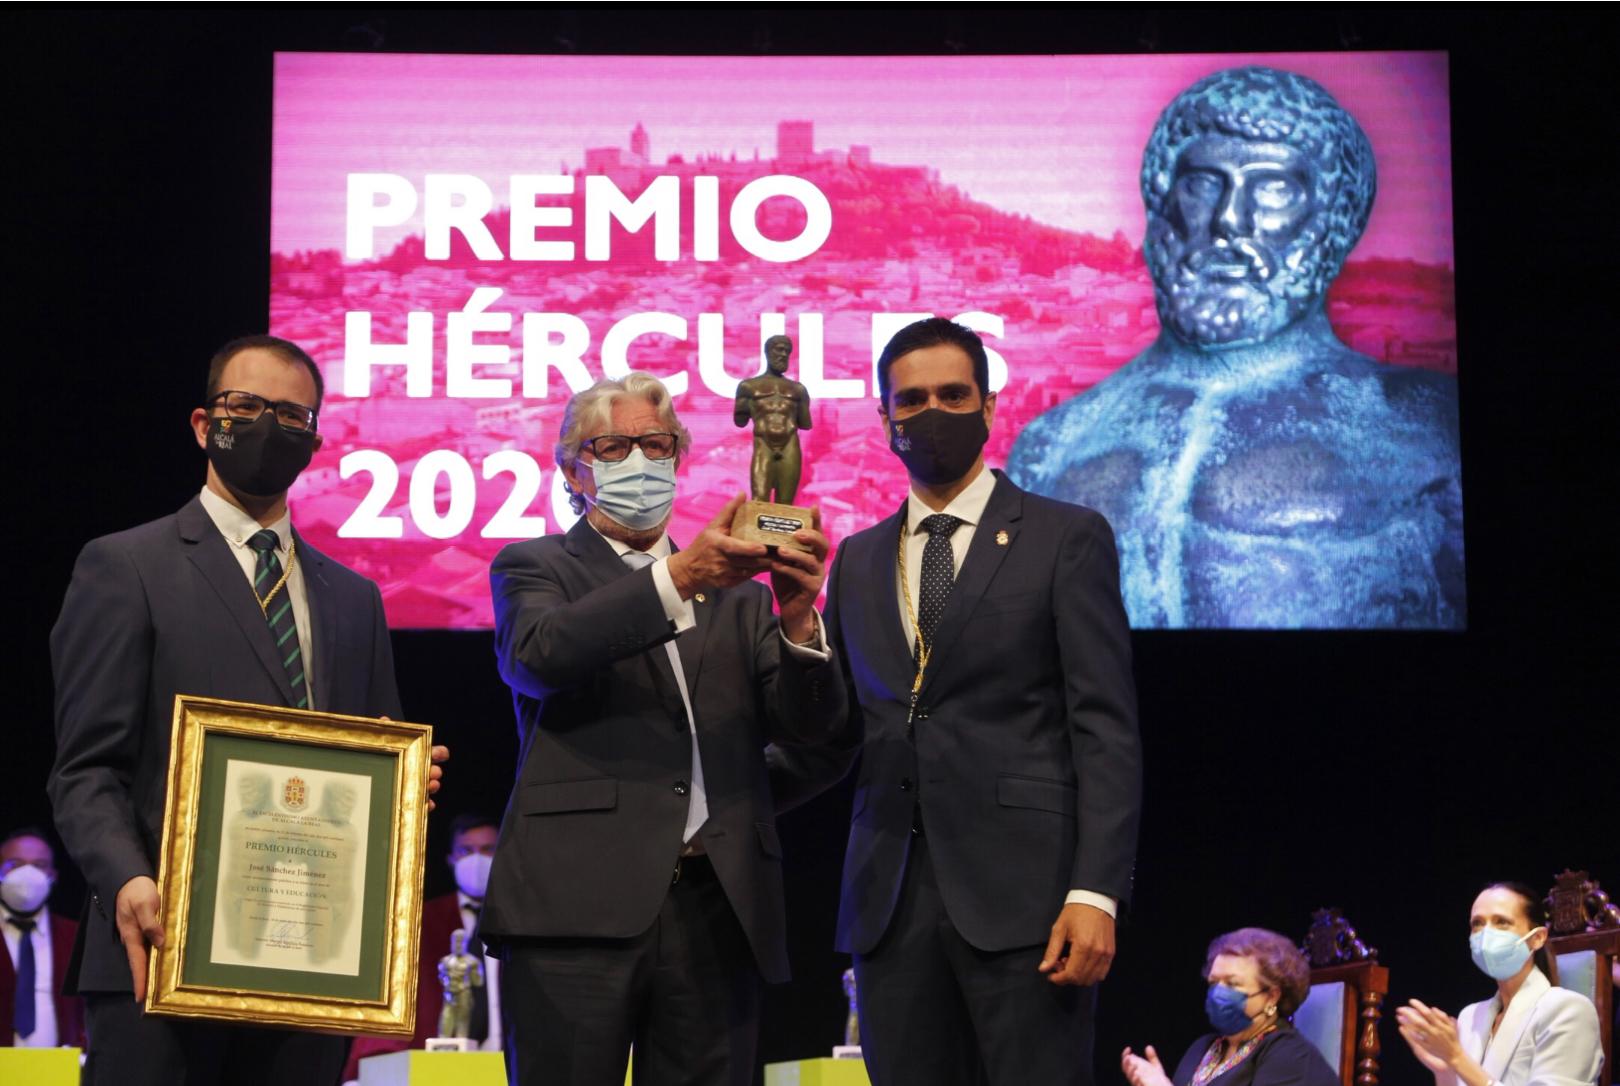 José Sánchez premios Hércules